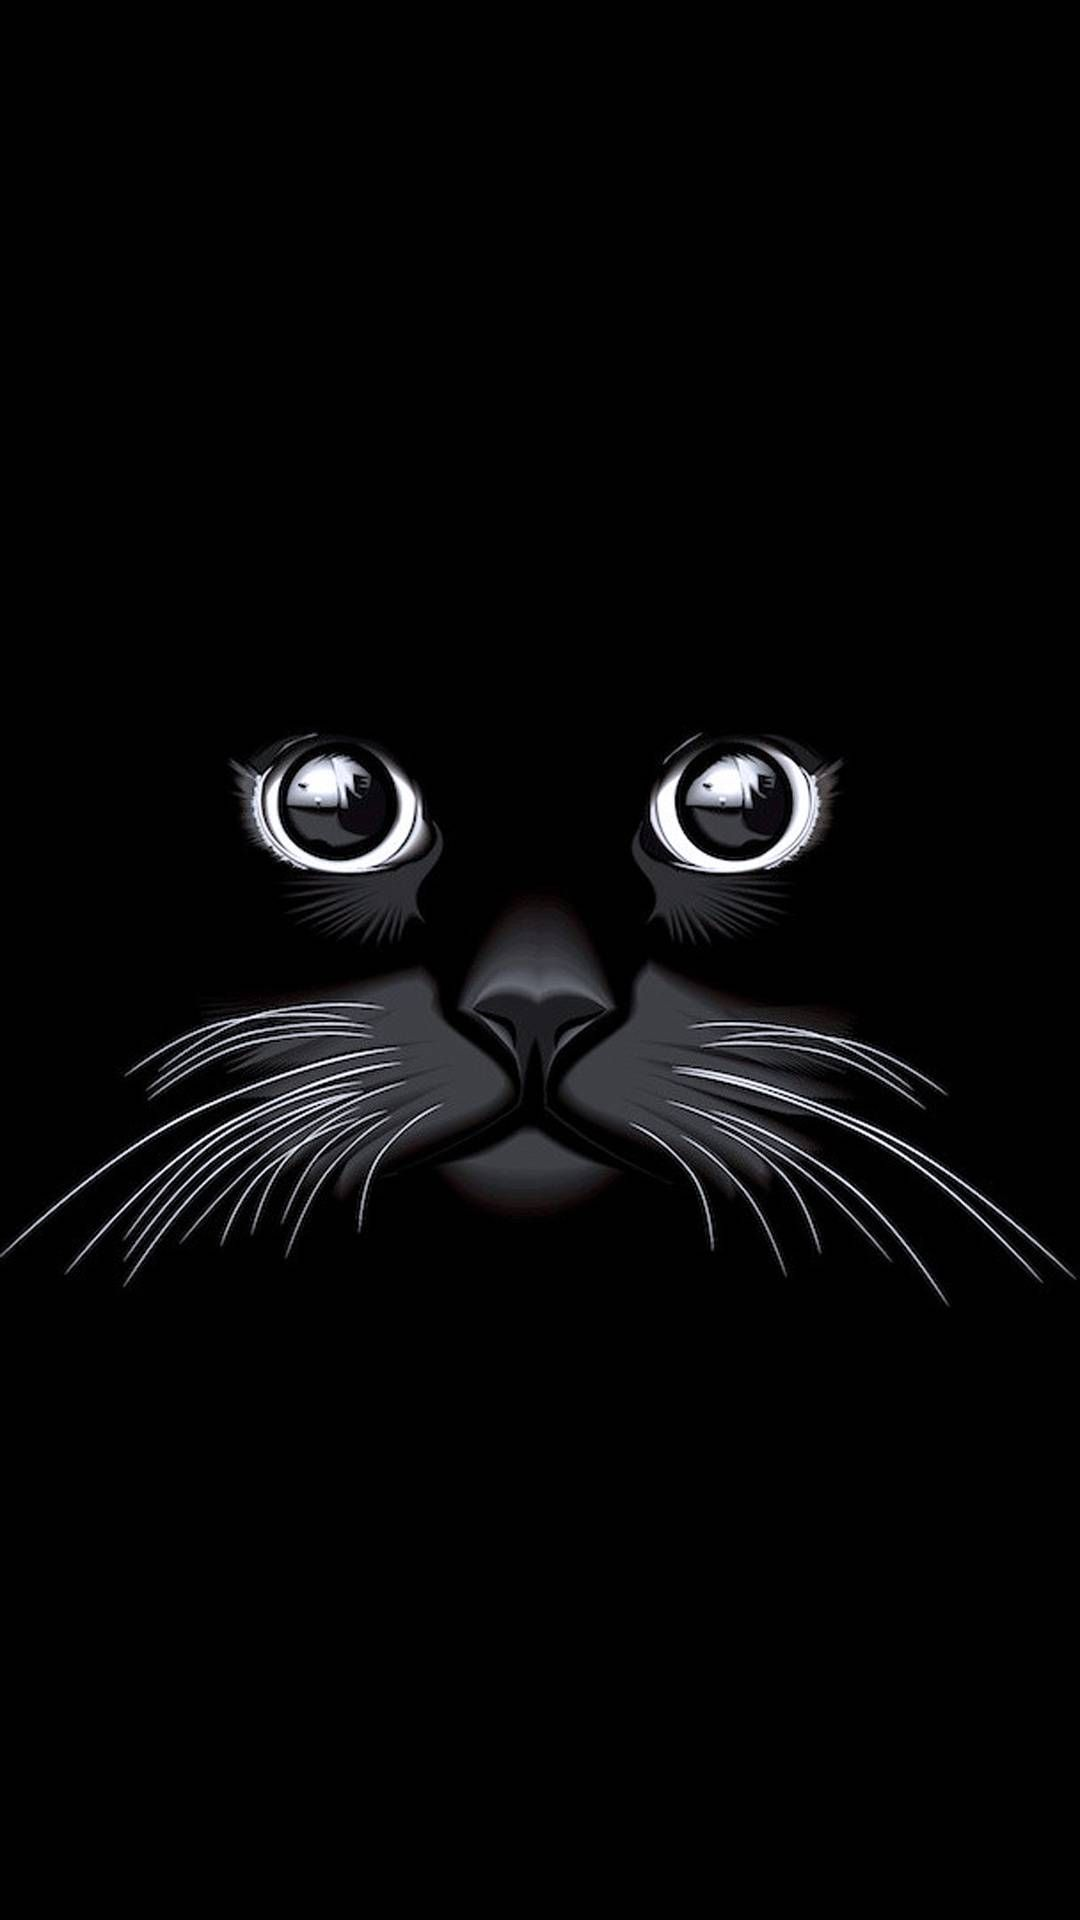 Black Cat Mobile Hd Wallpaper In 2020 Eyes Wallpaper Cat Wallpaper Black Phone Wallpaper